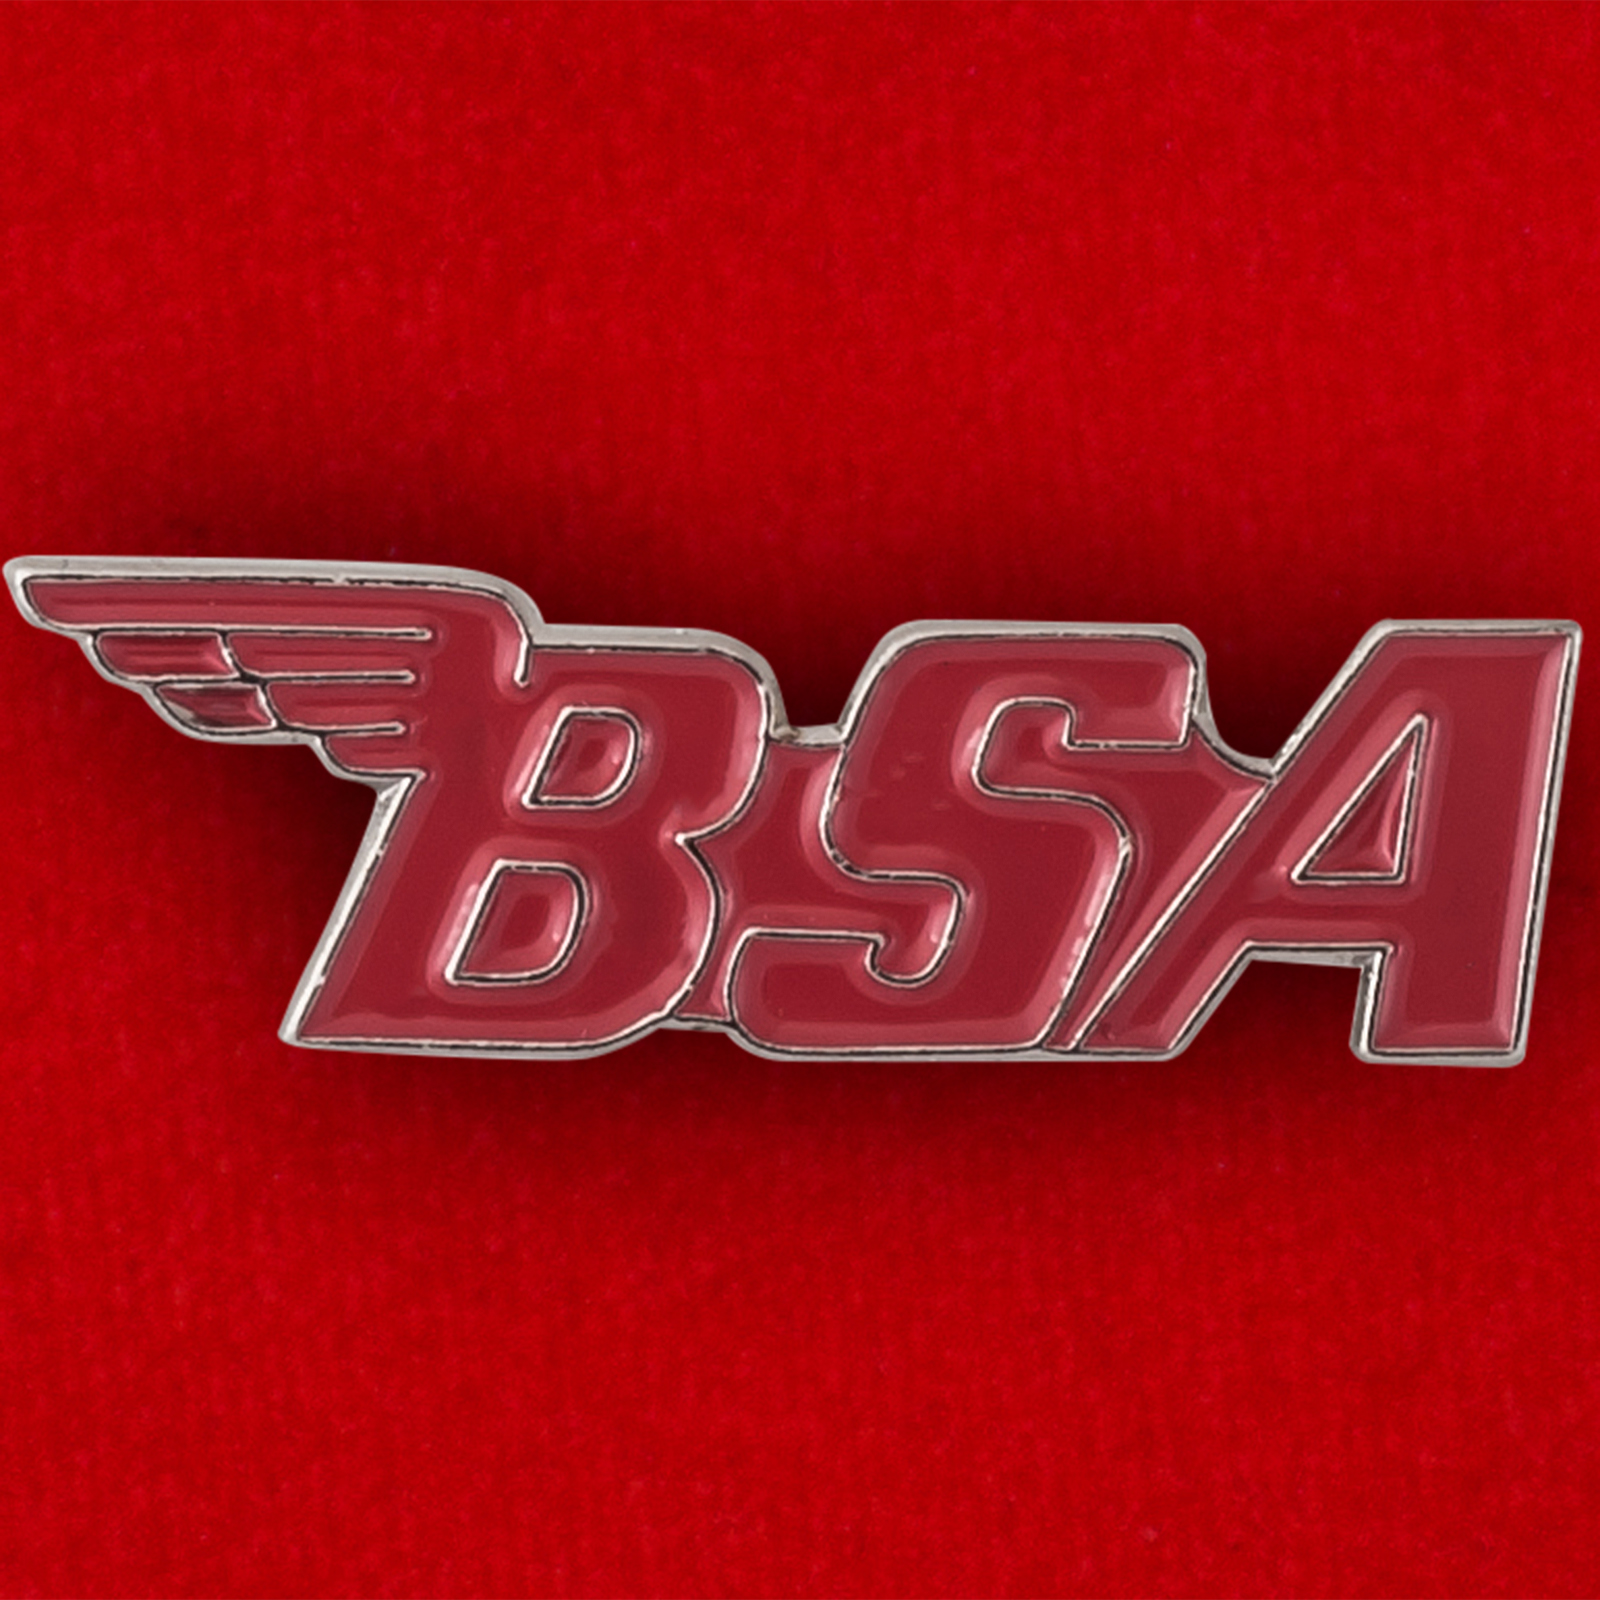 Байкерский значок BSA